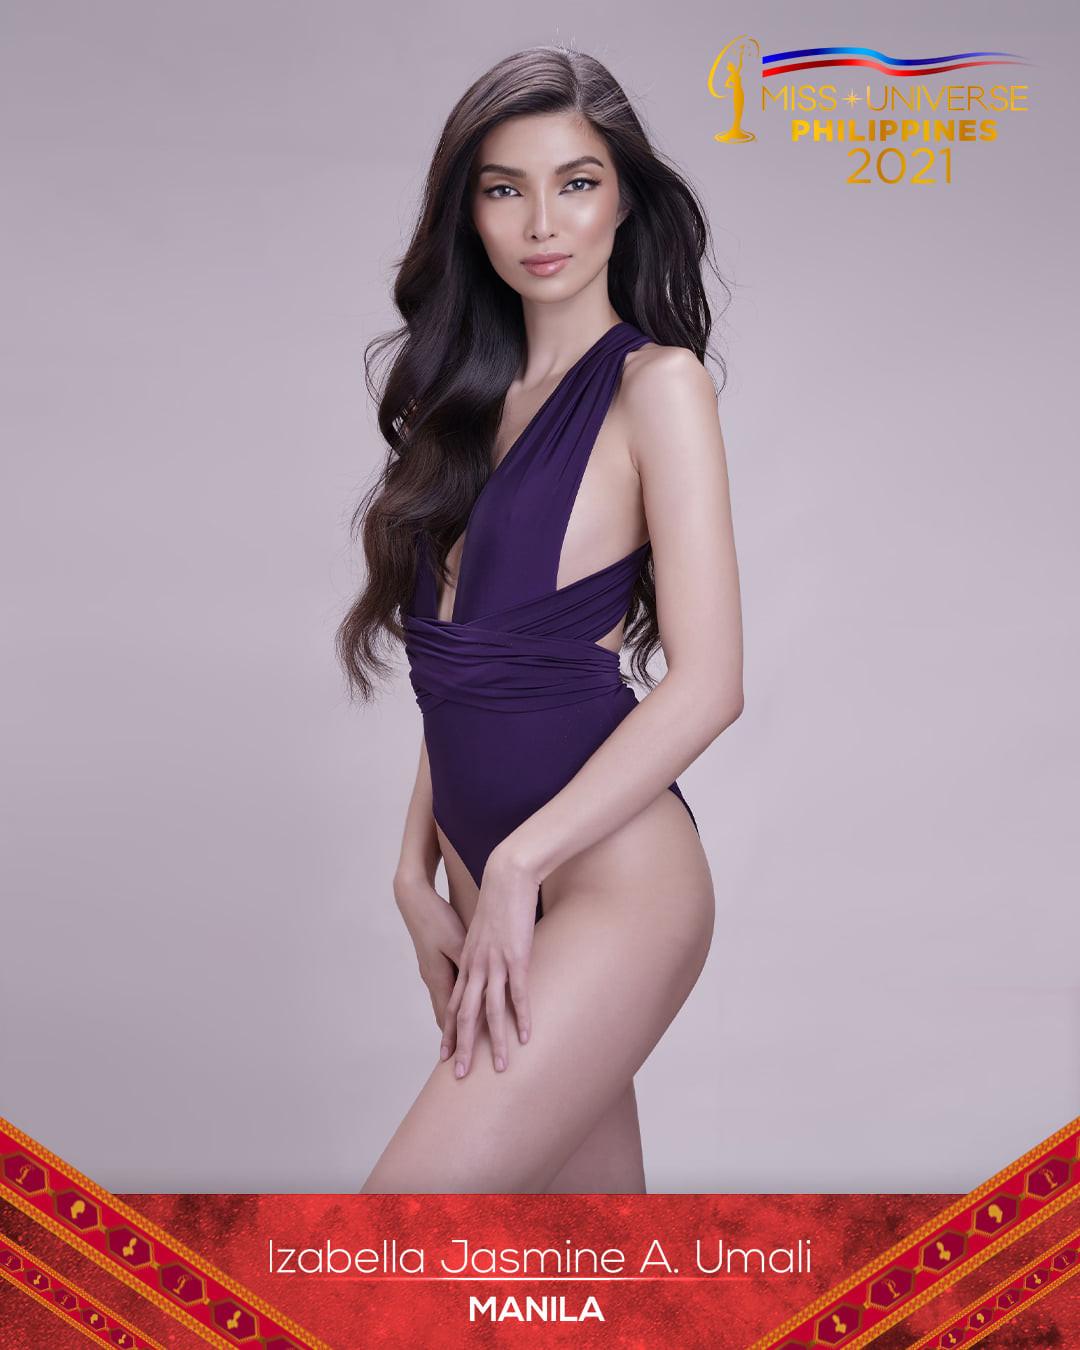 75 pre-candidatas a miss universe philippines 2021. - Página 4 RT2WKP